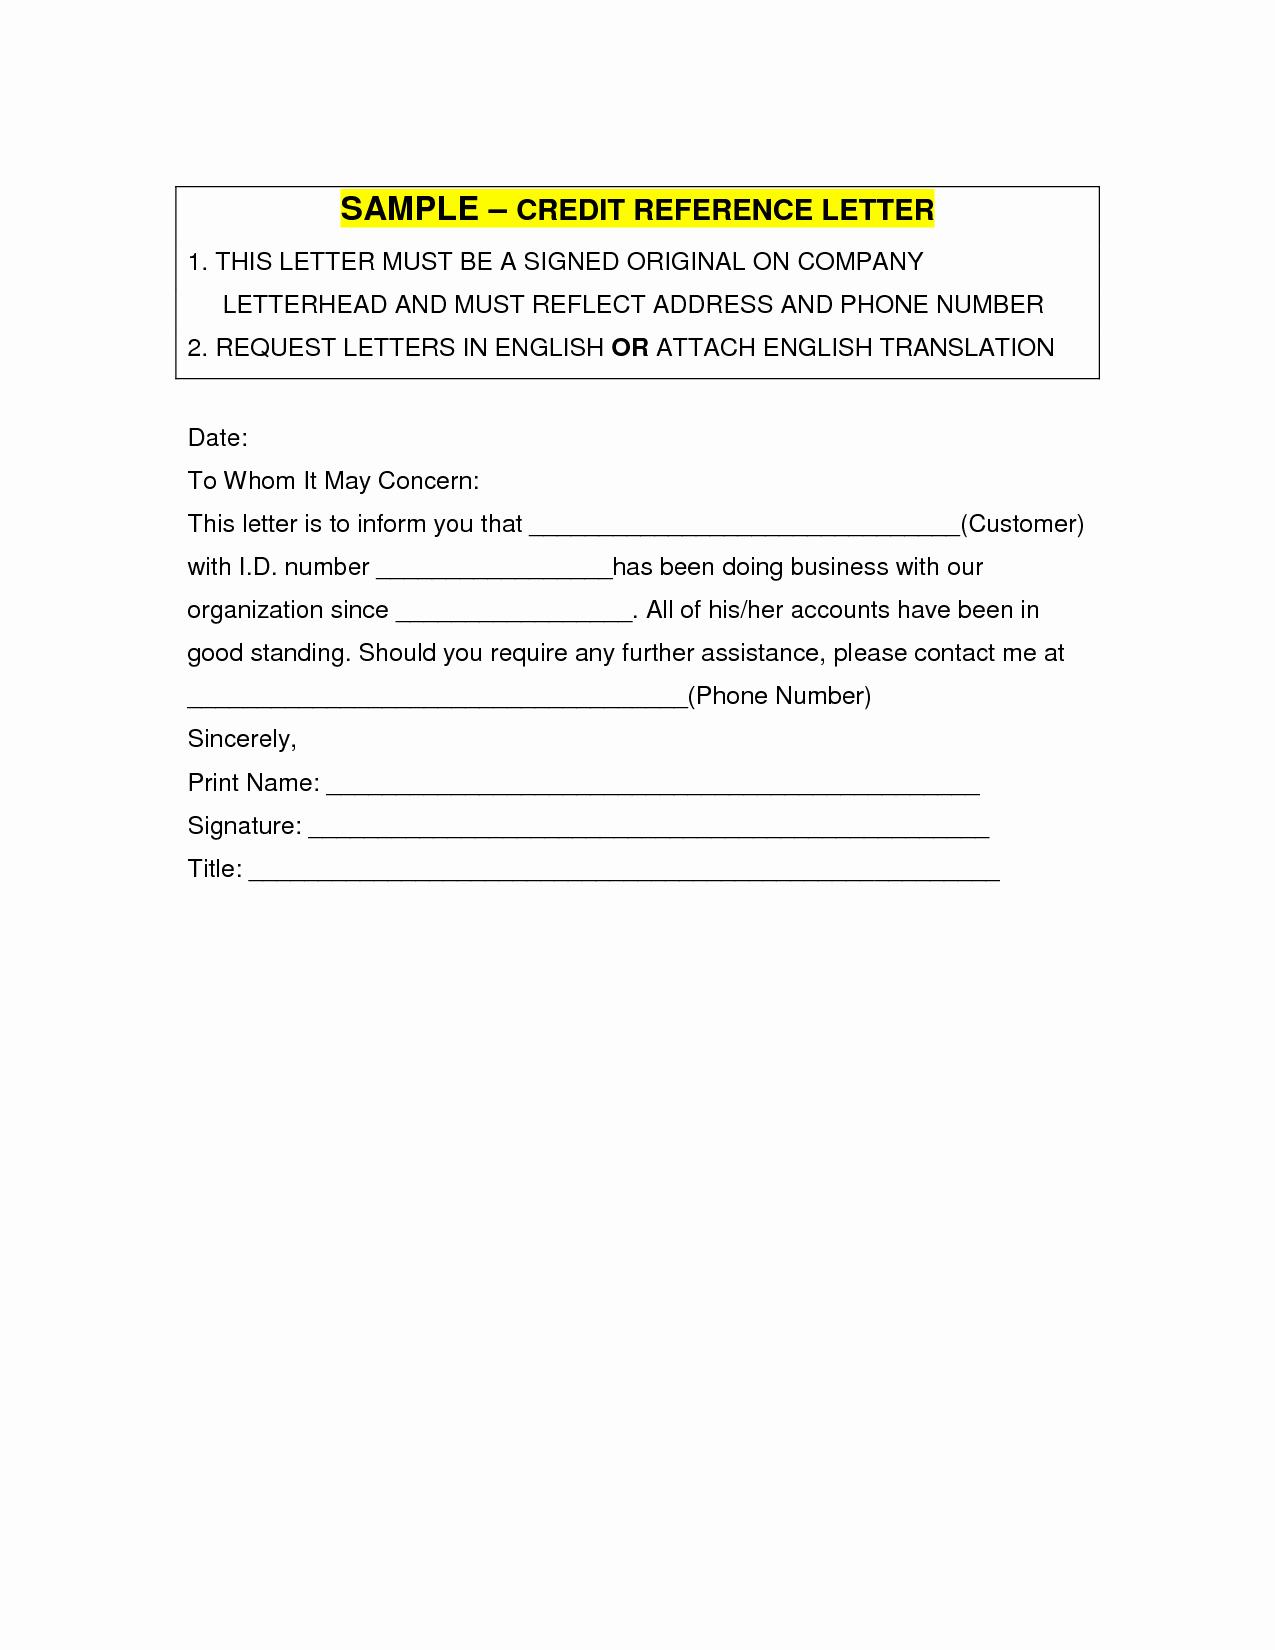 Credit Reference Sheet Template Beautiful Business Credit Reference Template Free Printable Documents